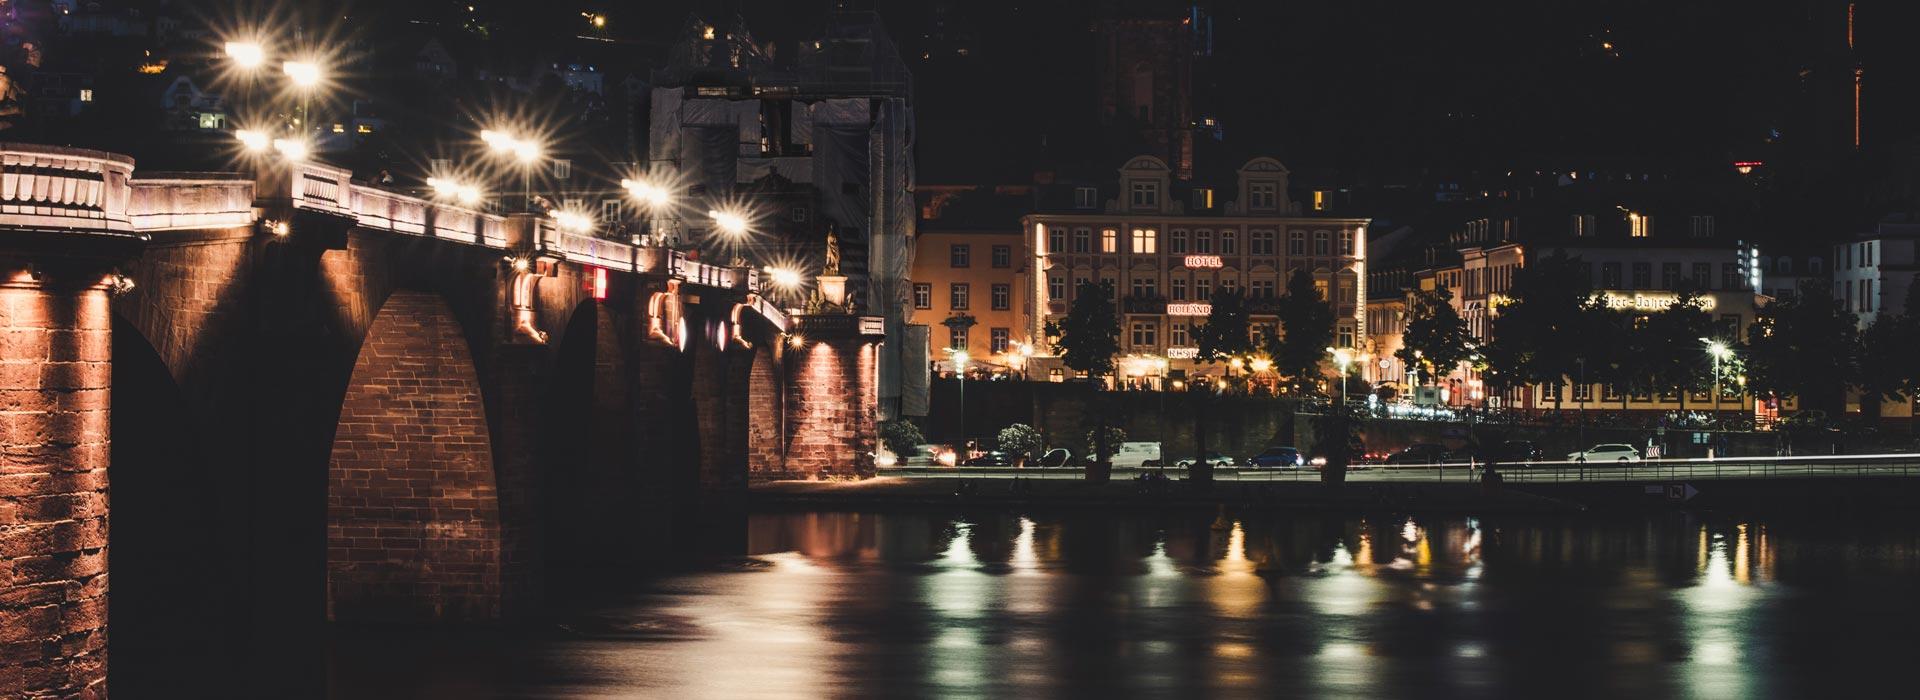 Fotokurs | Heidelberg bei Nacht